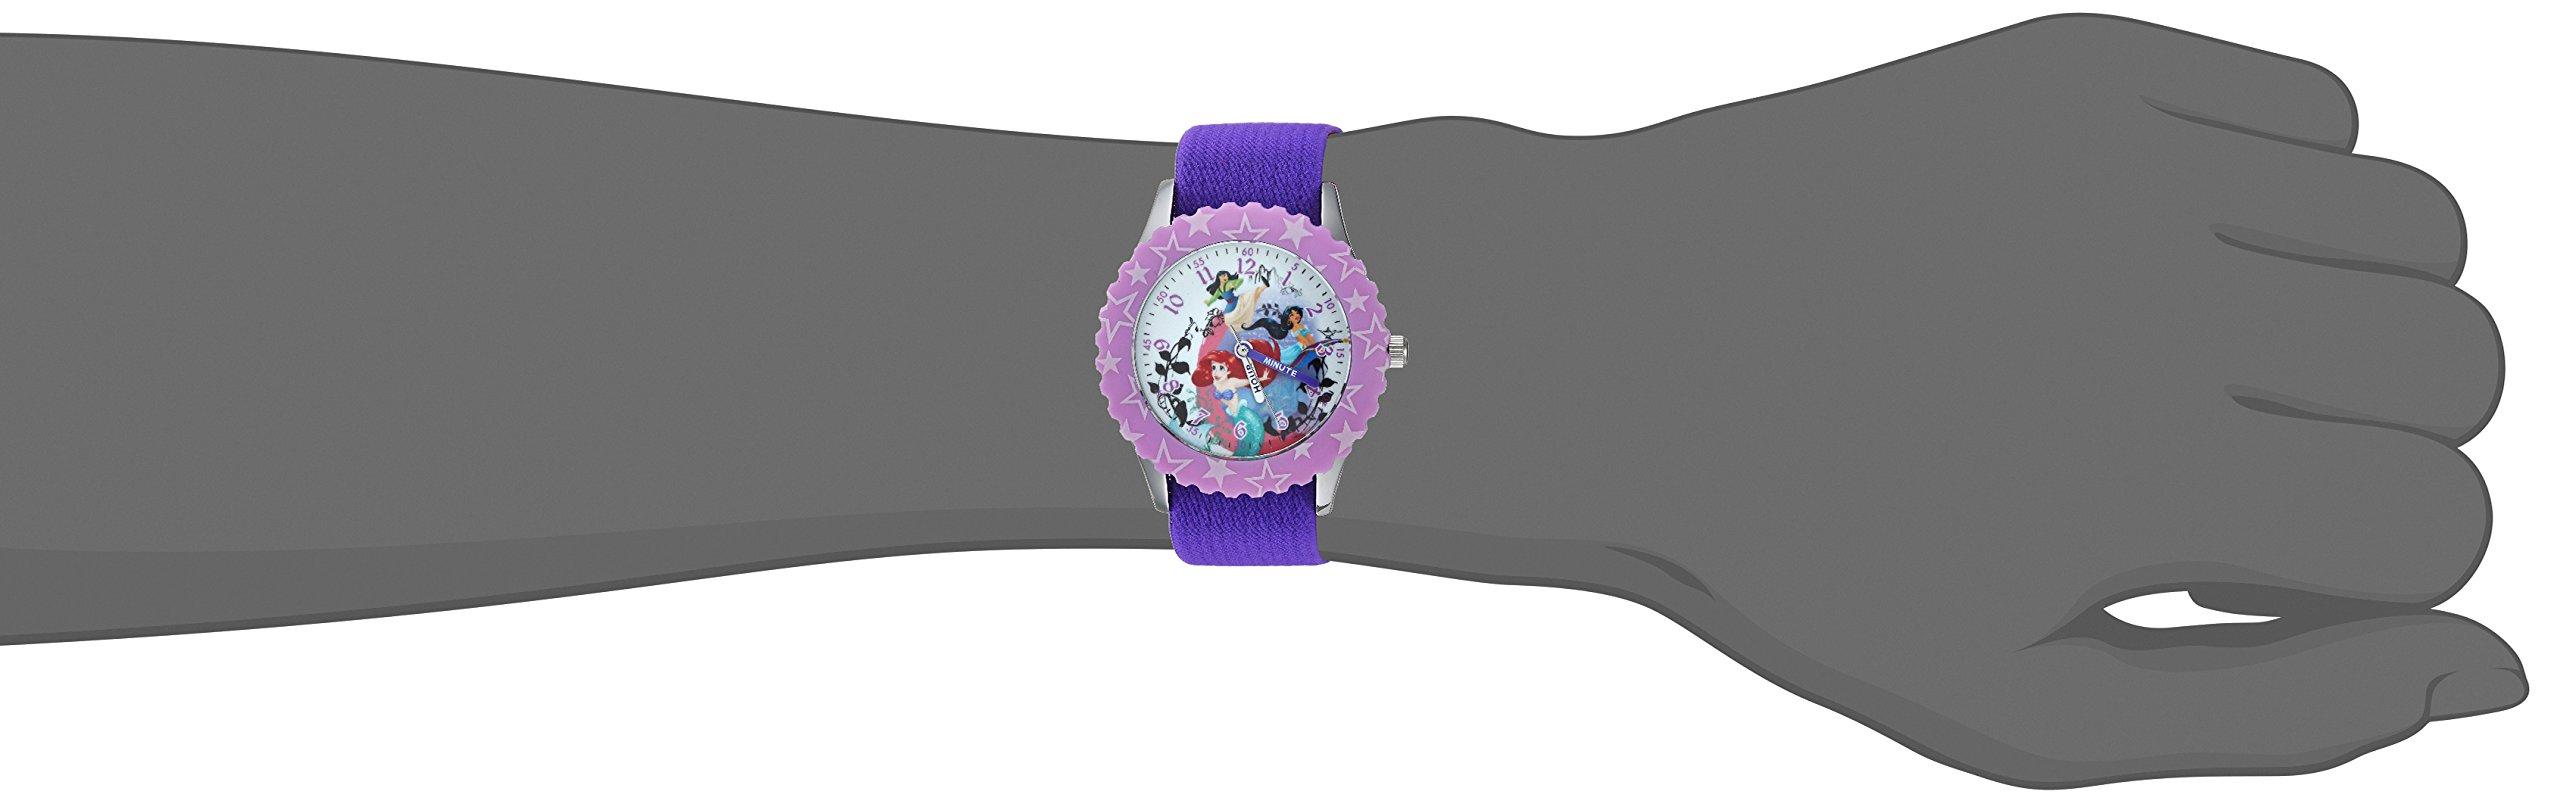 DISNEY Girls Princess Mulan Stainless Steel Analog-Quartz Watch with Nylon Strap, Purple, 15 (Model: WDS000200) by Disney (Image #2)